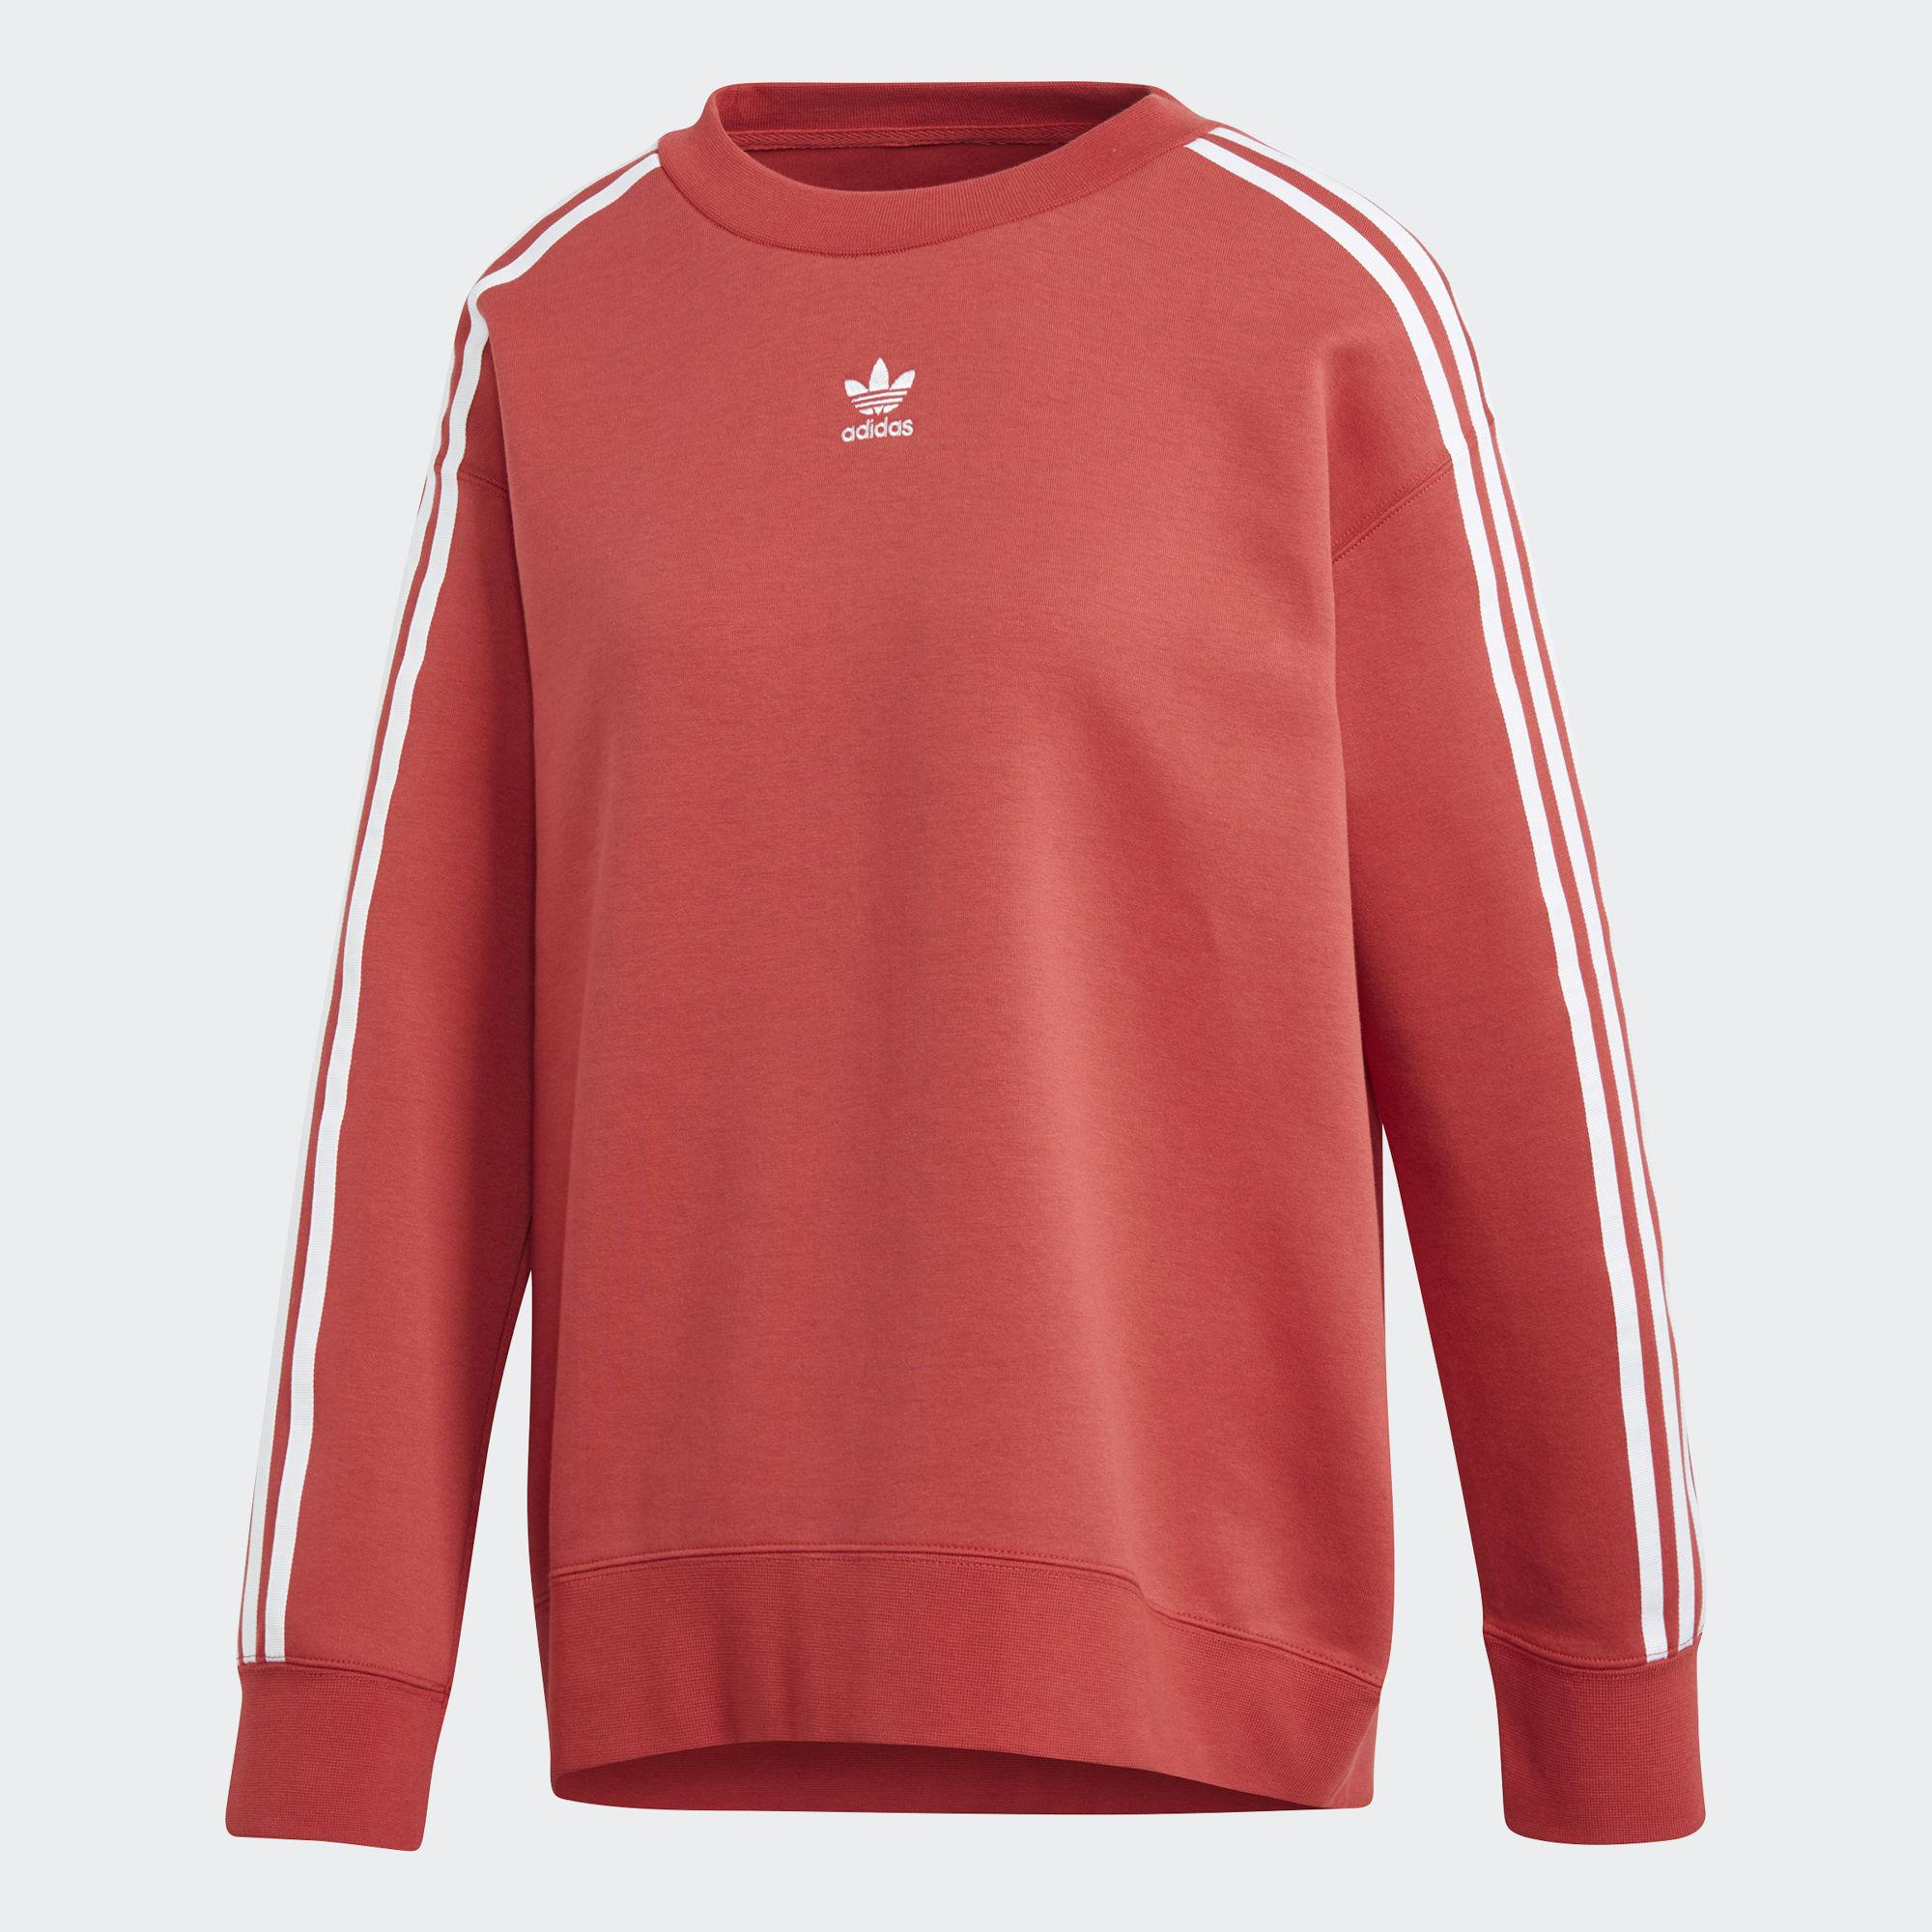 Свитшот женский adidas Crew Sweater, цвет: коралловый. CE2432. Размер 38 (46)